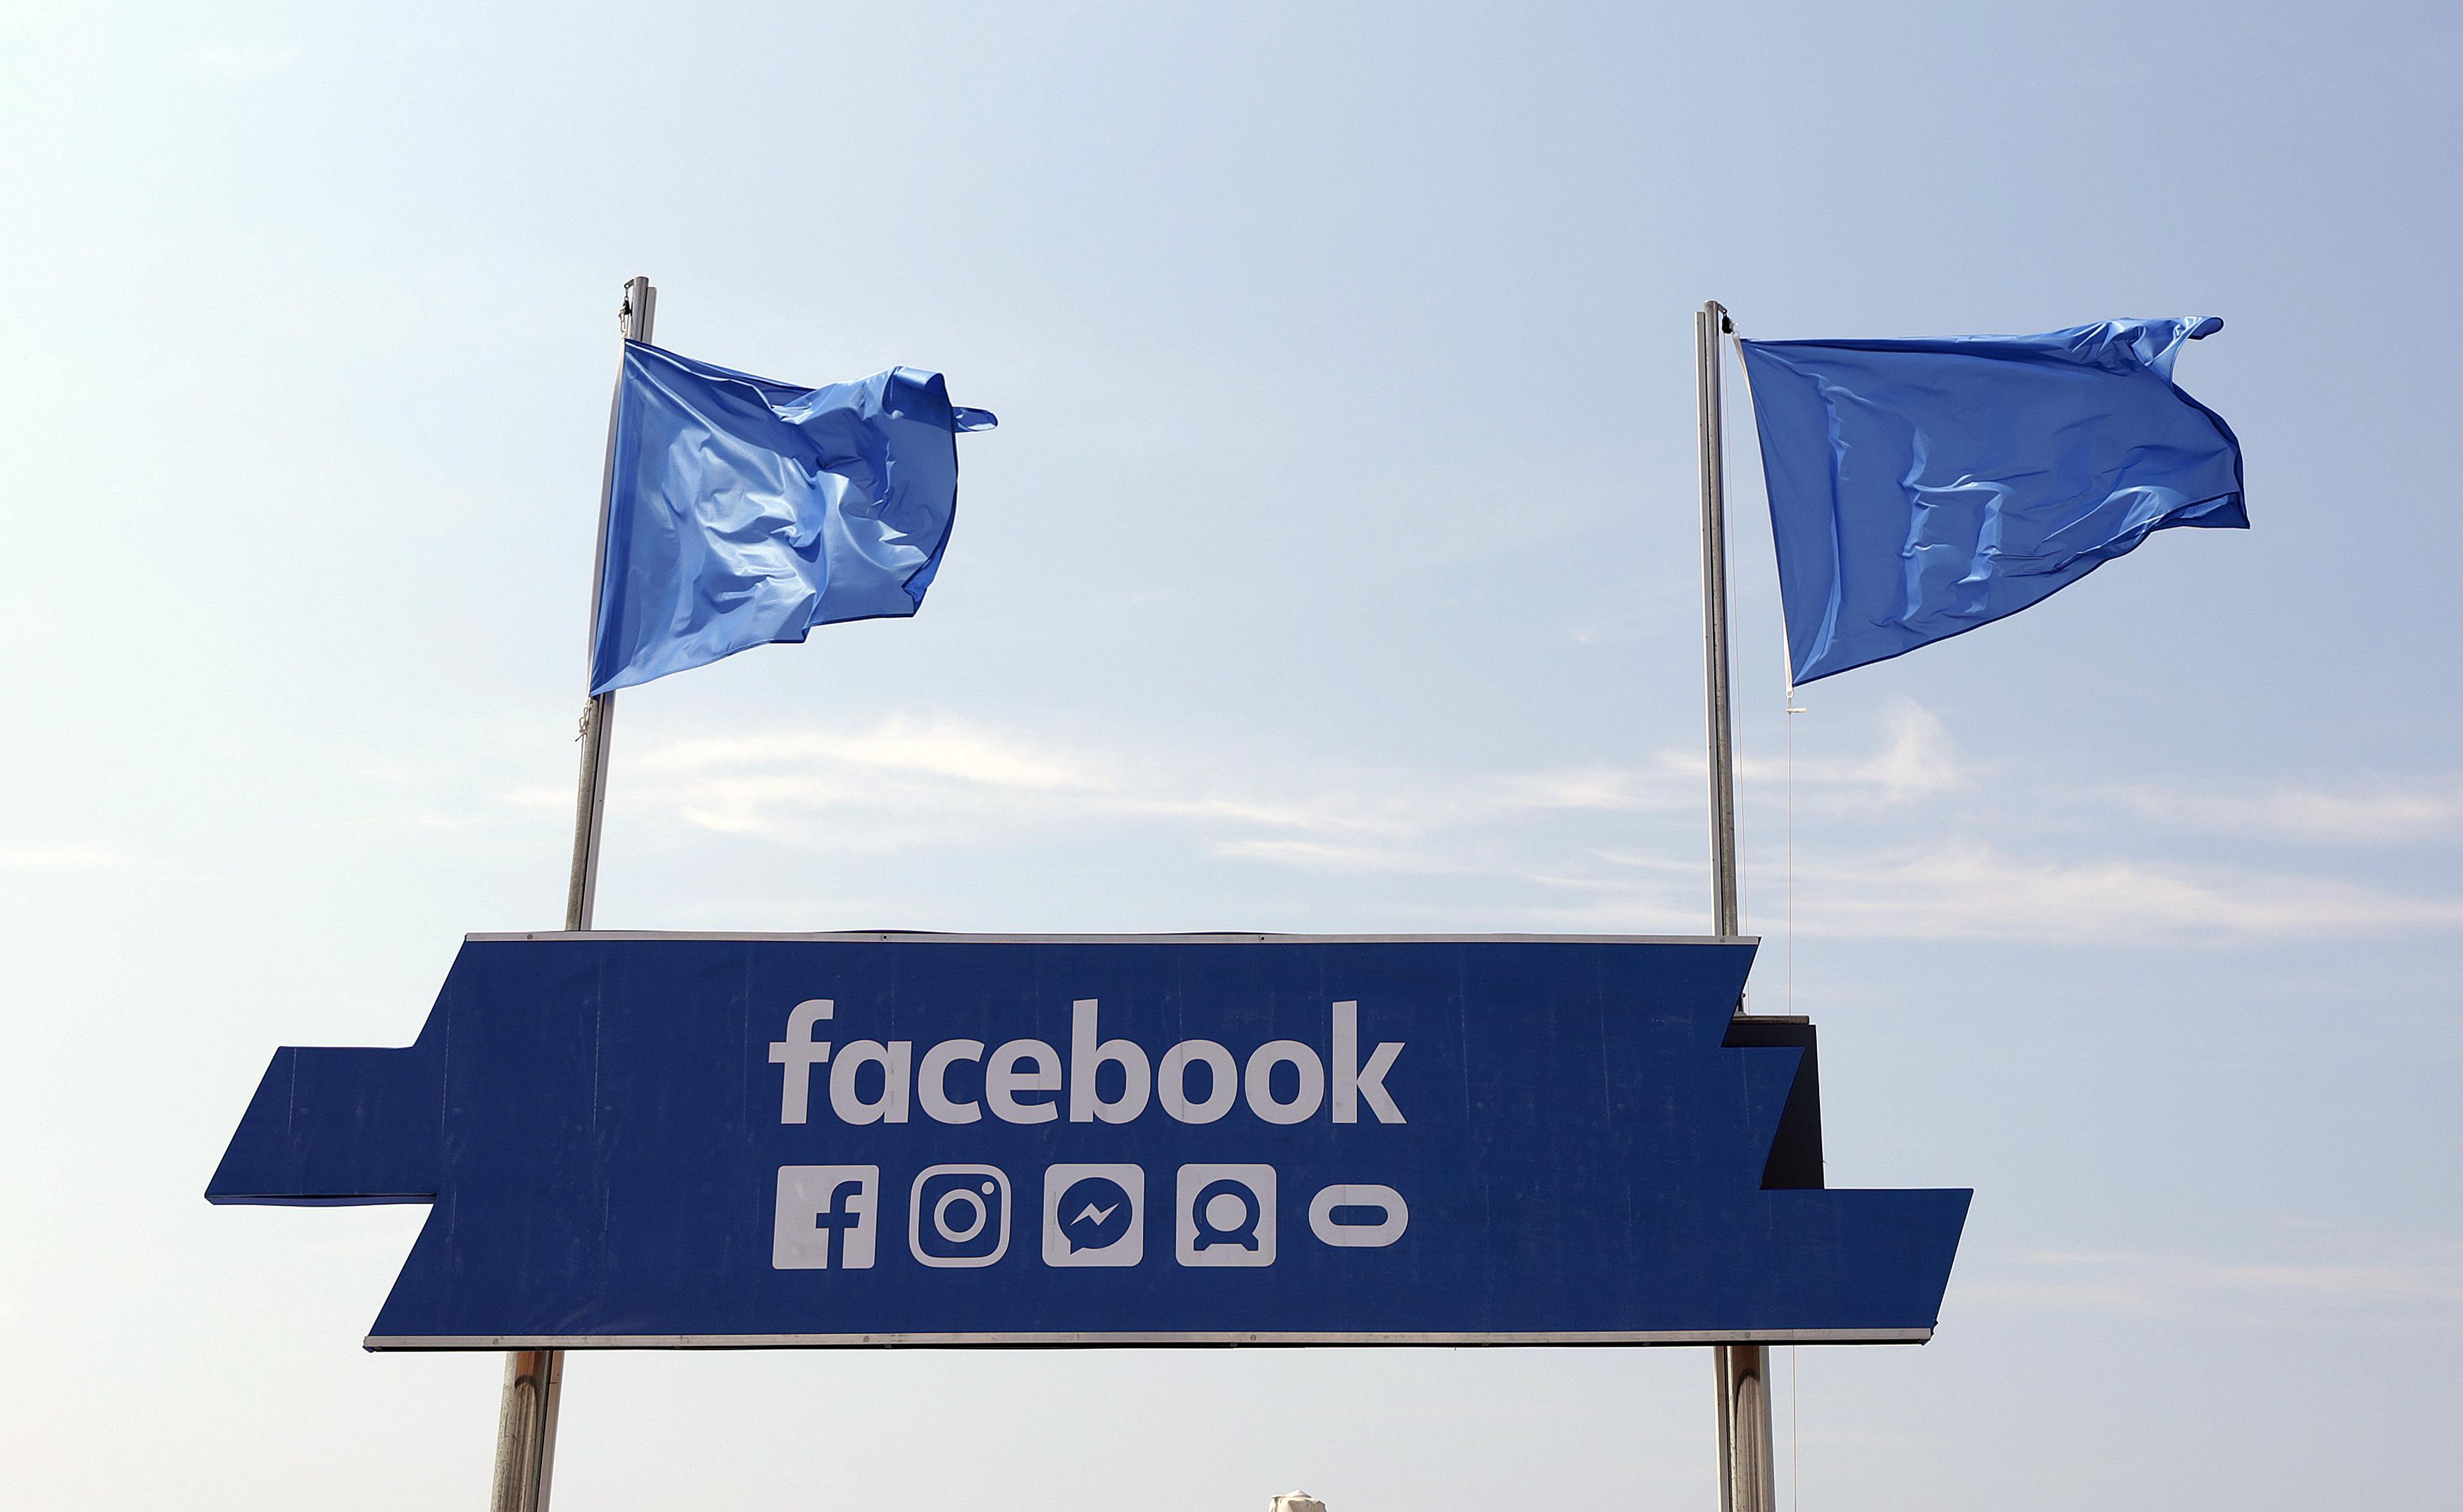 Facebook flags